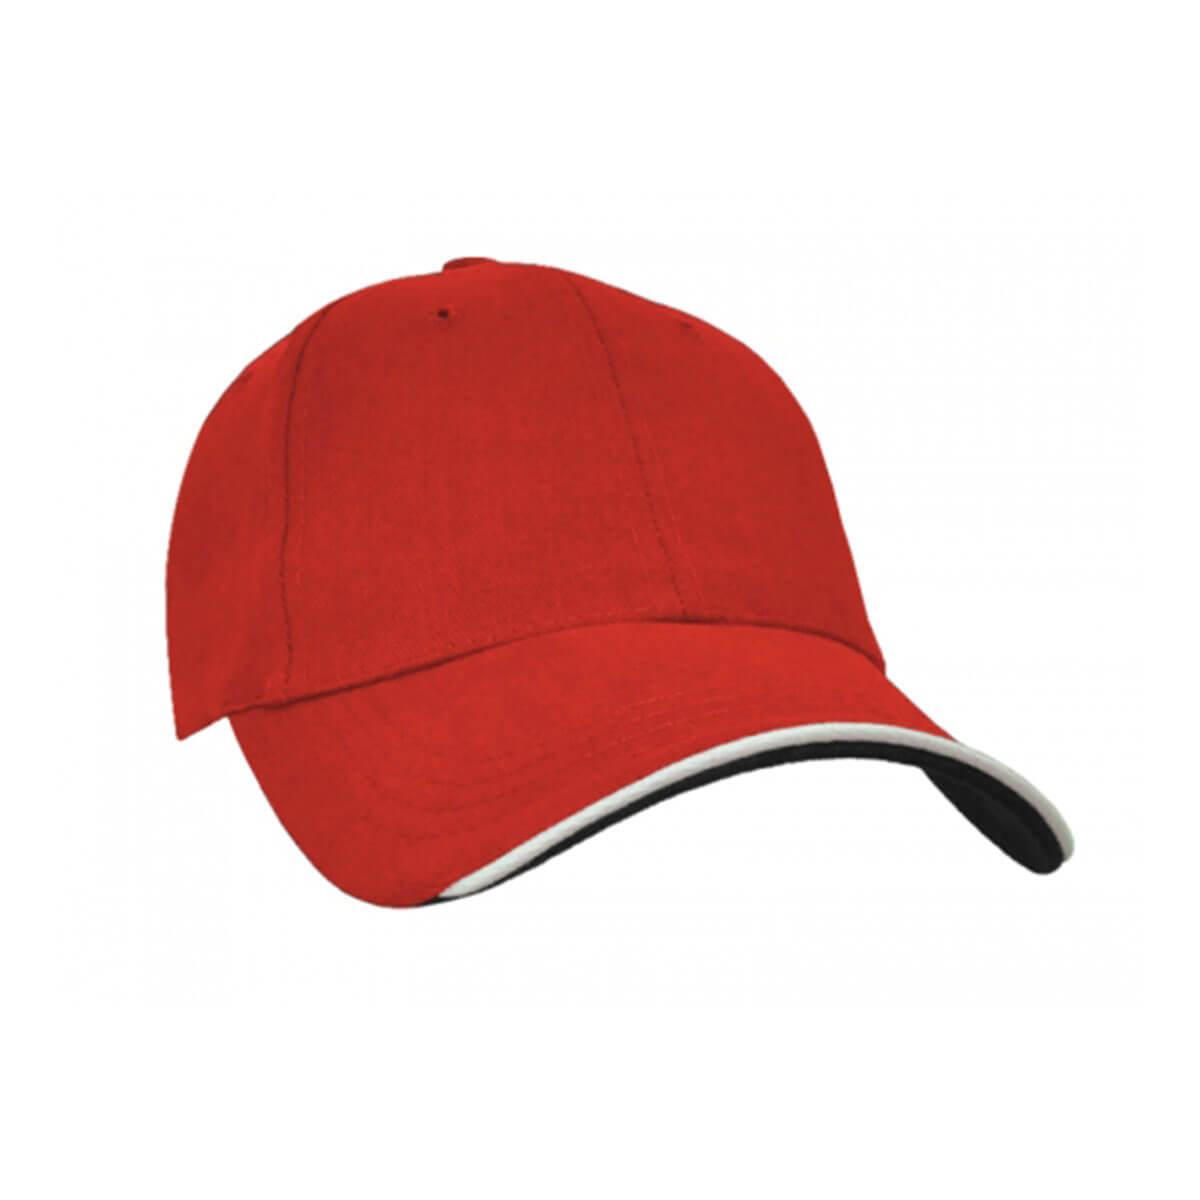 Navigator Cap-Red / White / Black